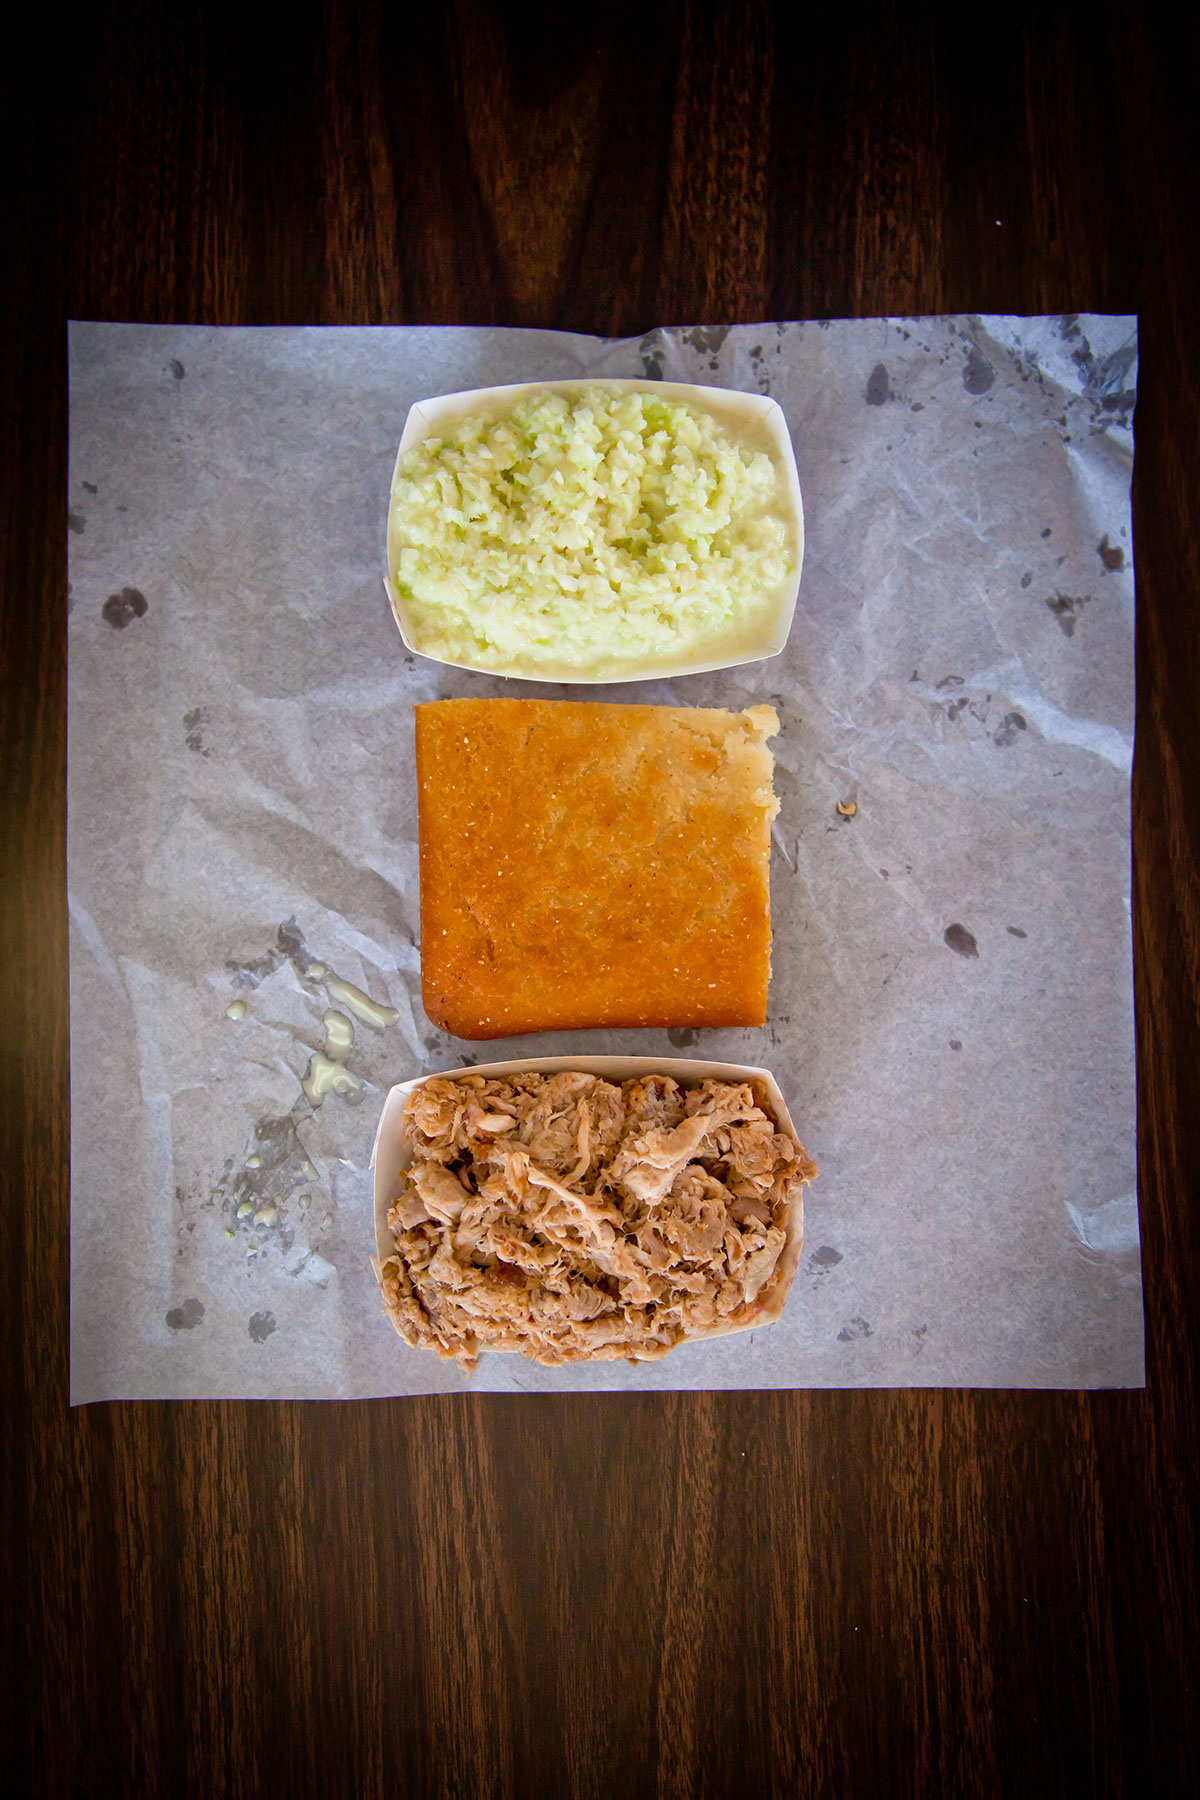 BBQ Tray, Slaw, Bread